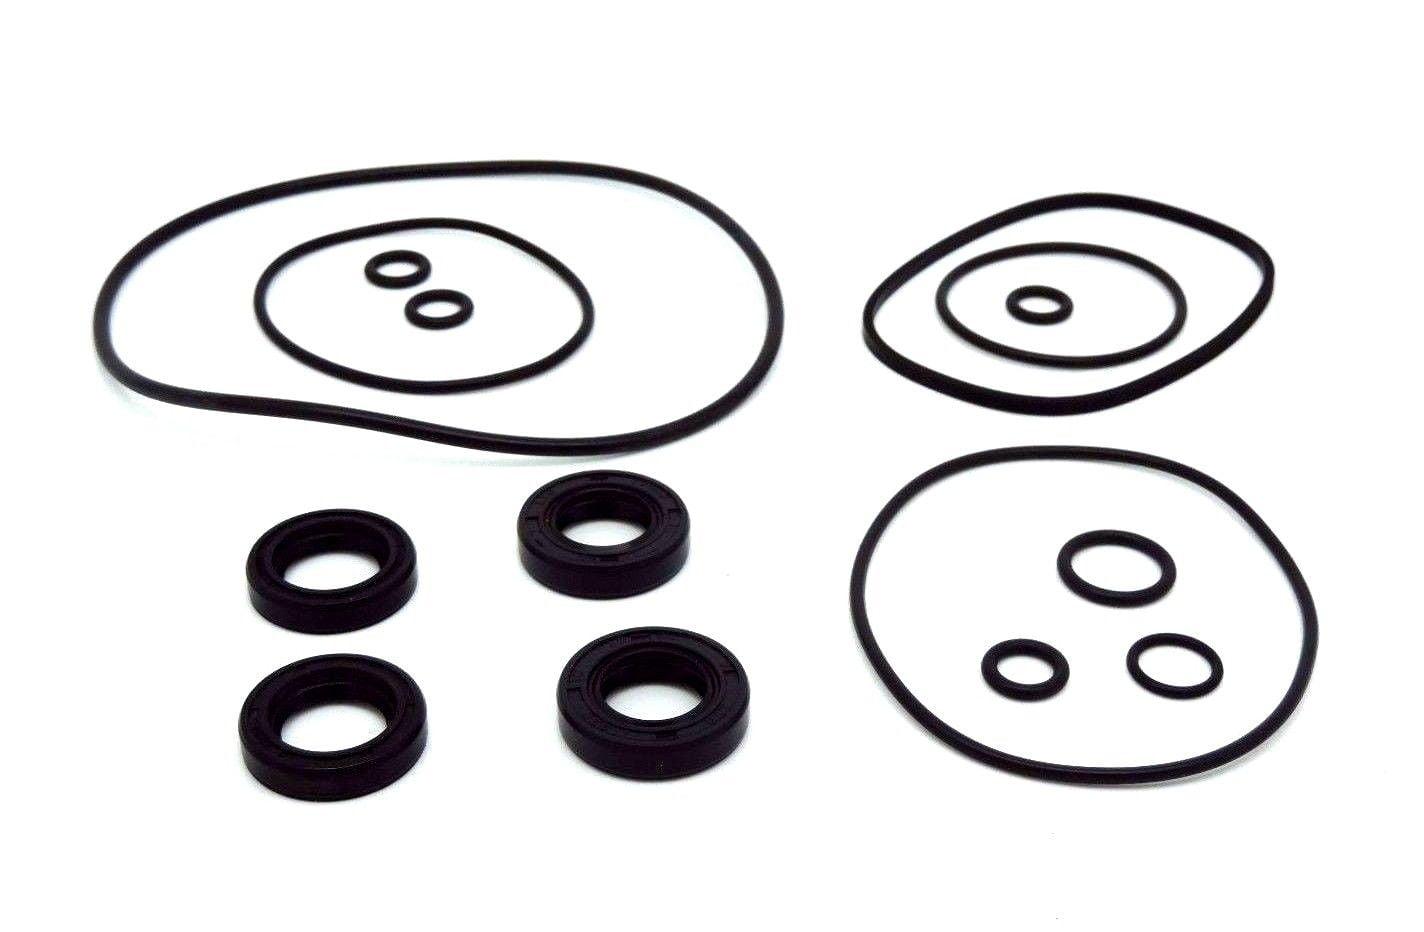 Power Steering Pump Seal Kit Fits Ford